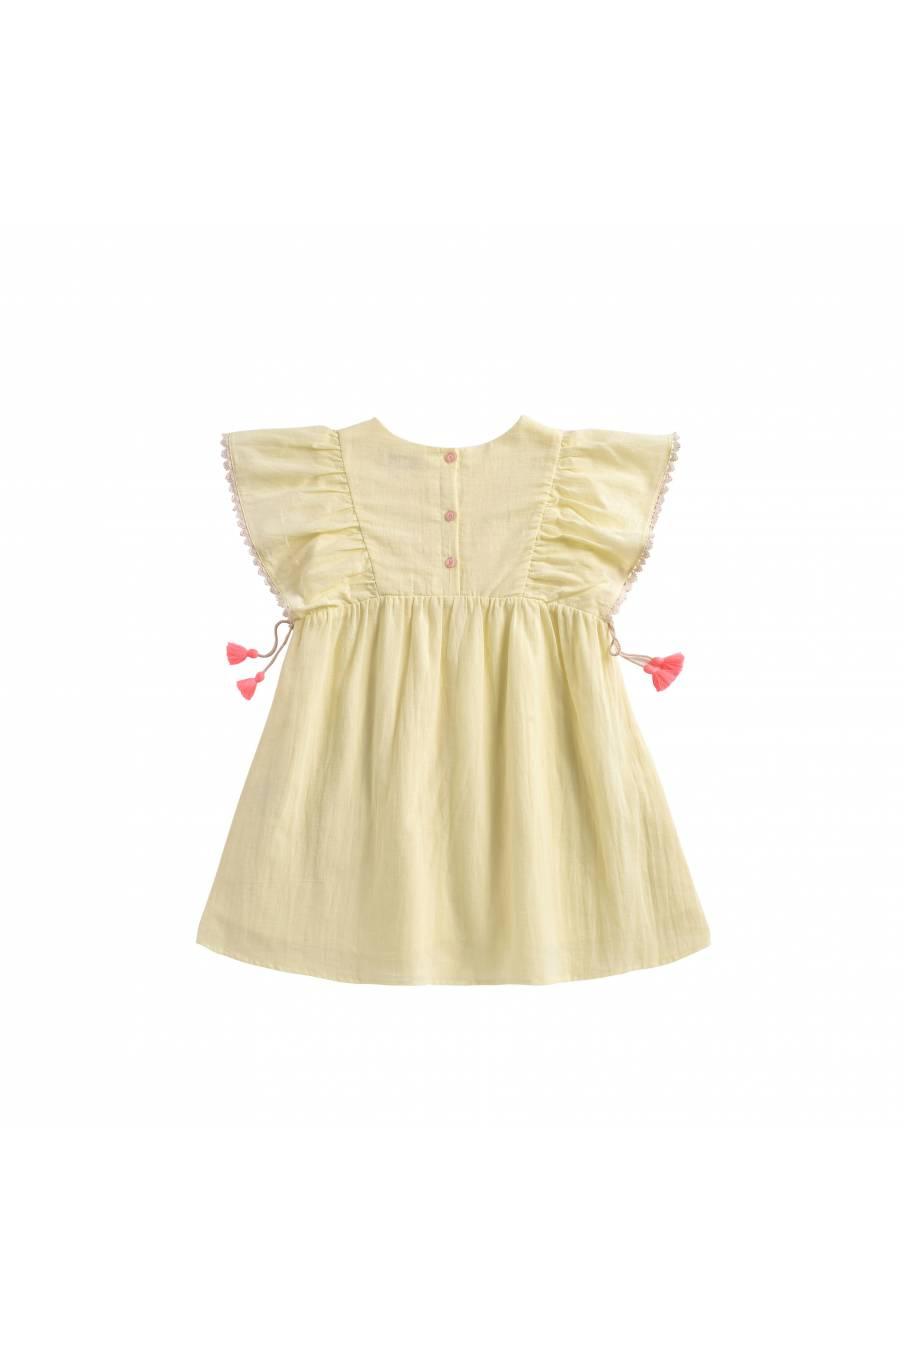 Dress Khalo French Vanilla